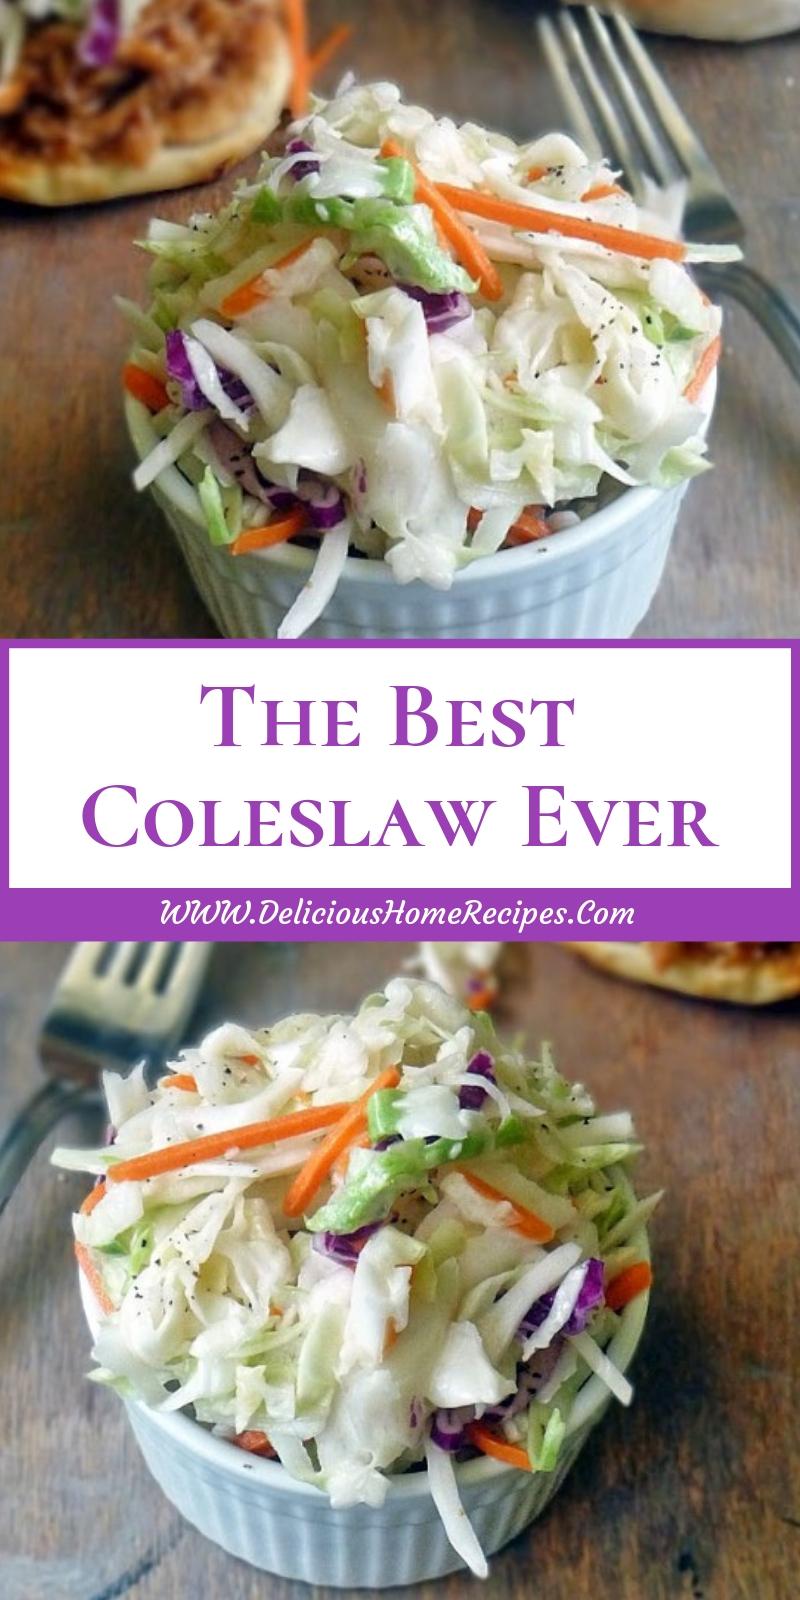 The Best Coleslaw Ever